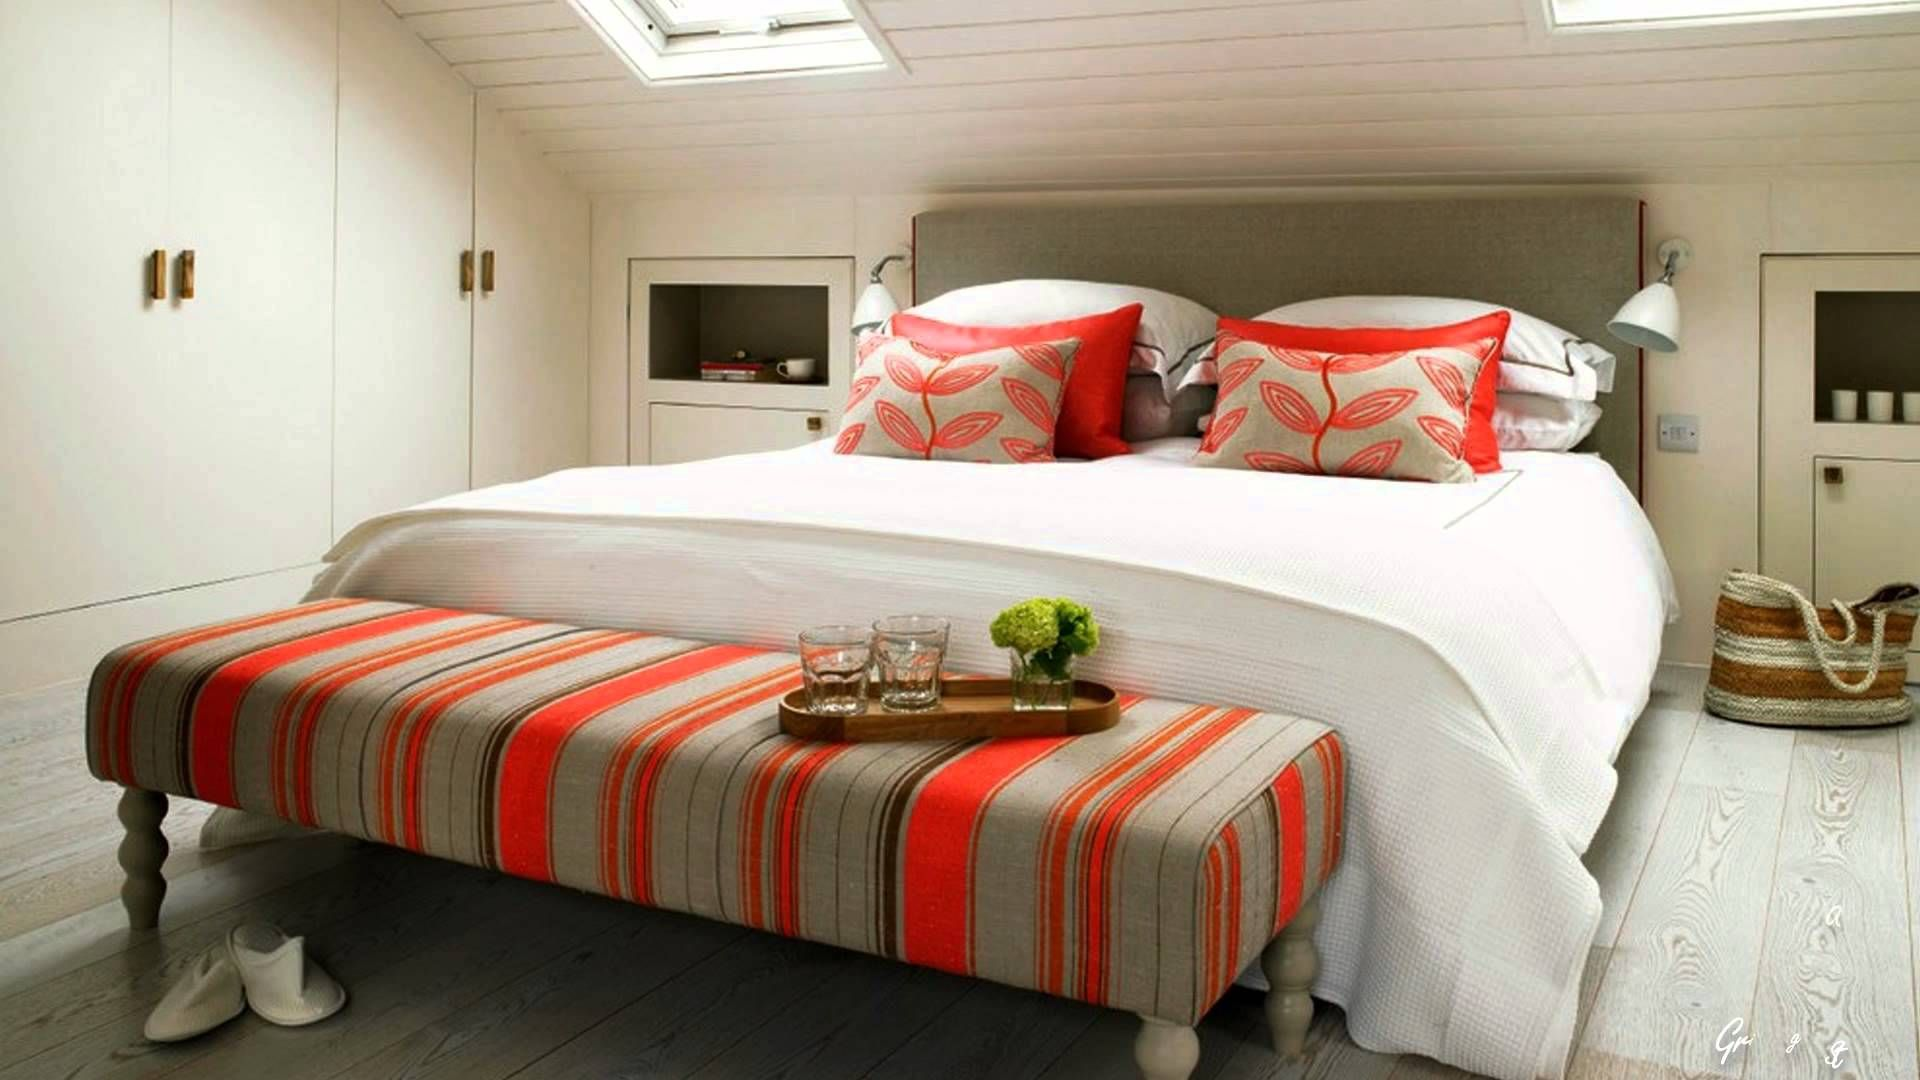 Attic Bedroom Design And Décor Tips